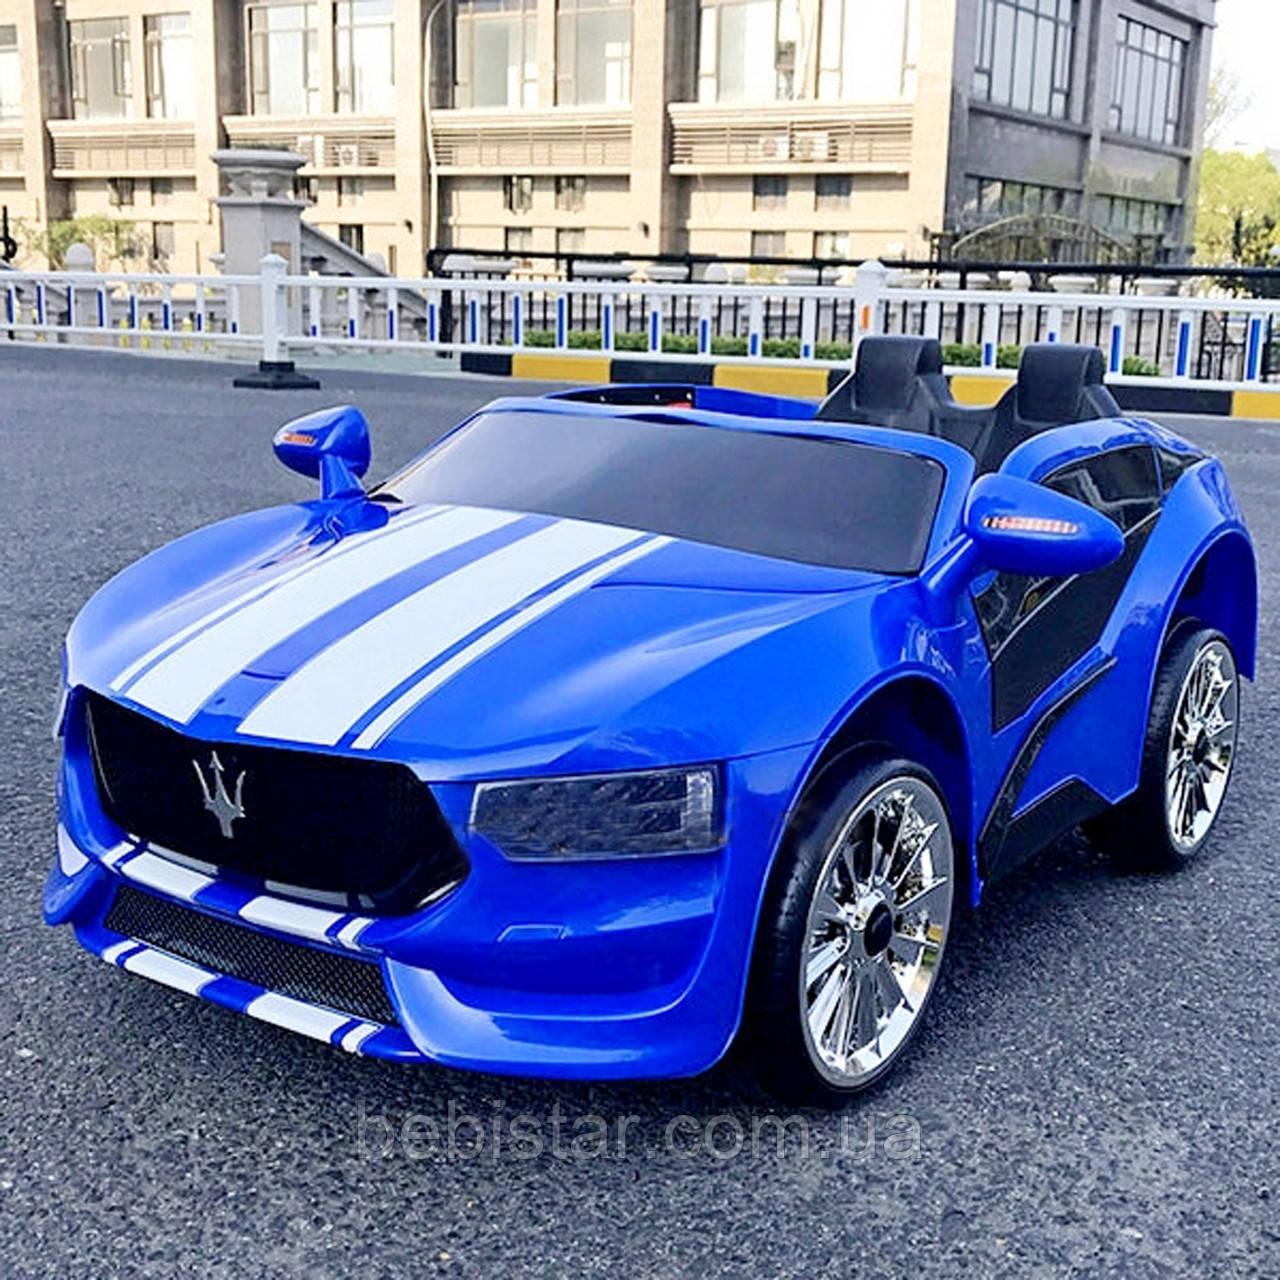 Электромобиль спорткар T-7624 BLUE для деток 3-8 лет с пультом мотор 2*20W с MP3